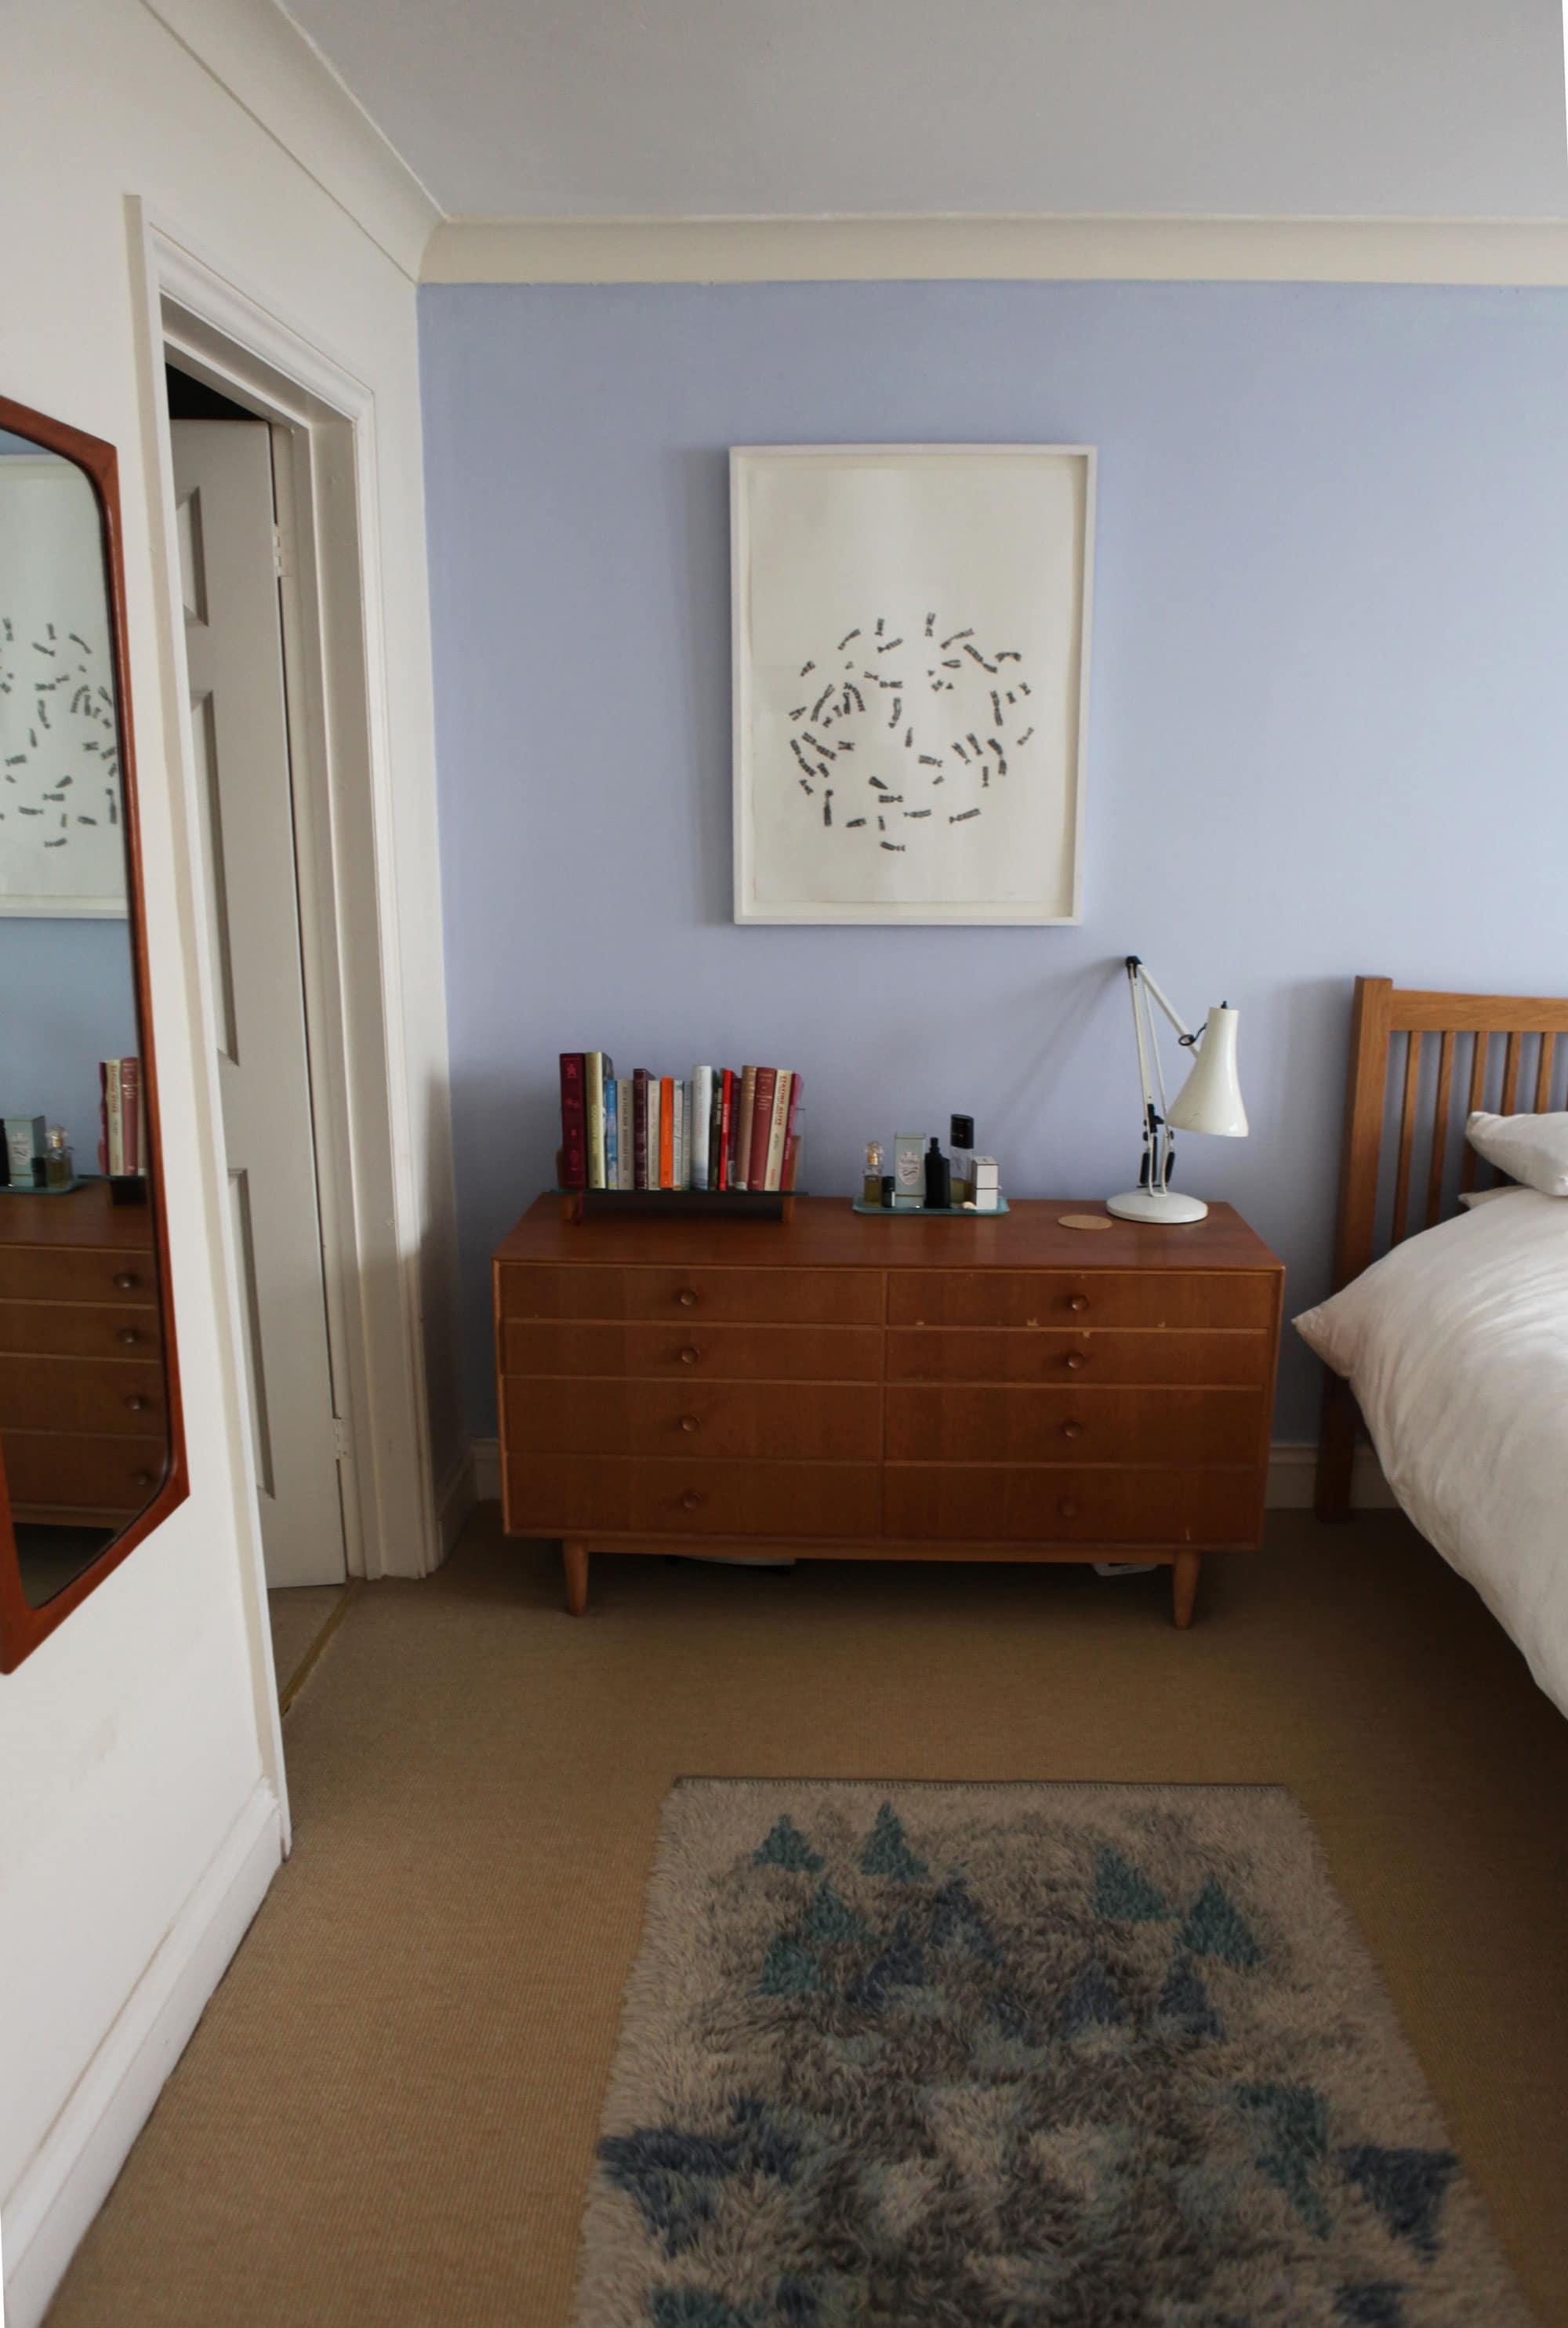 Lesley's Cozy Cool UK Coastal Home: gallery image 21